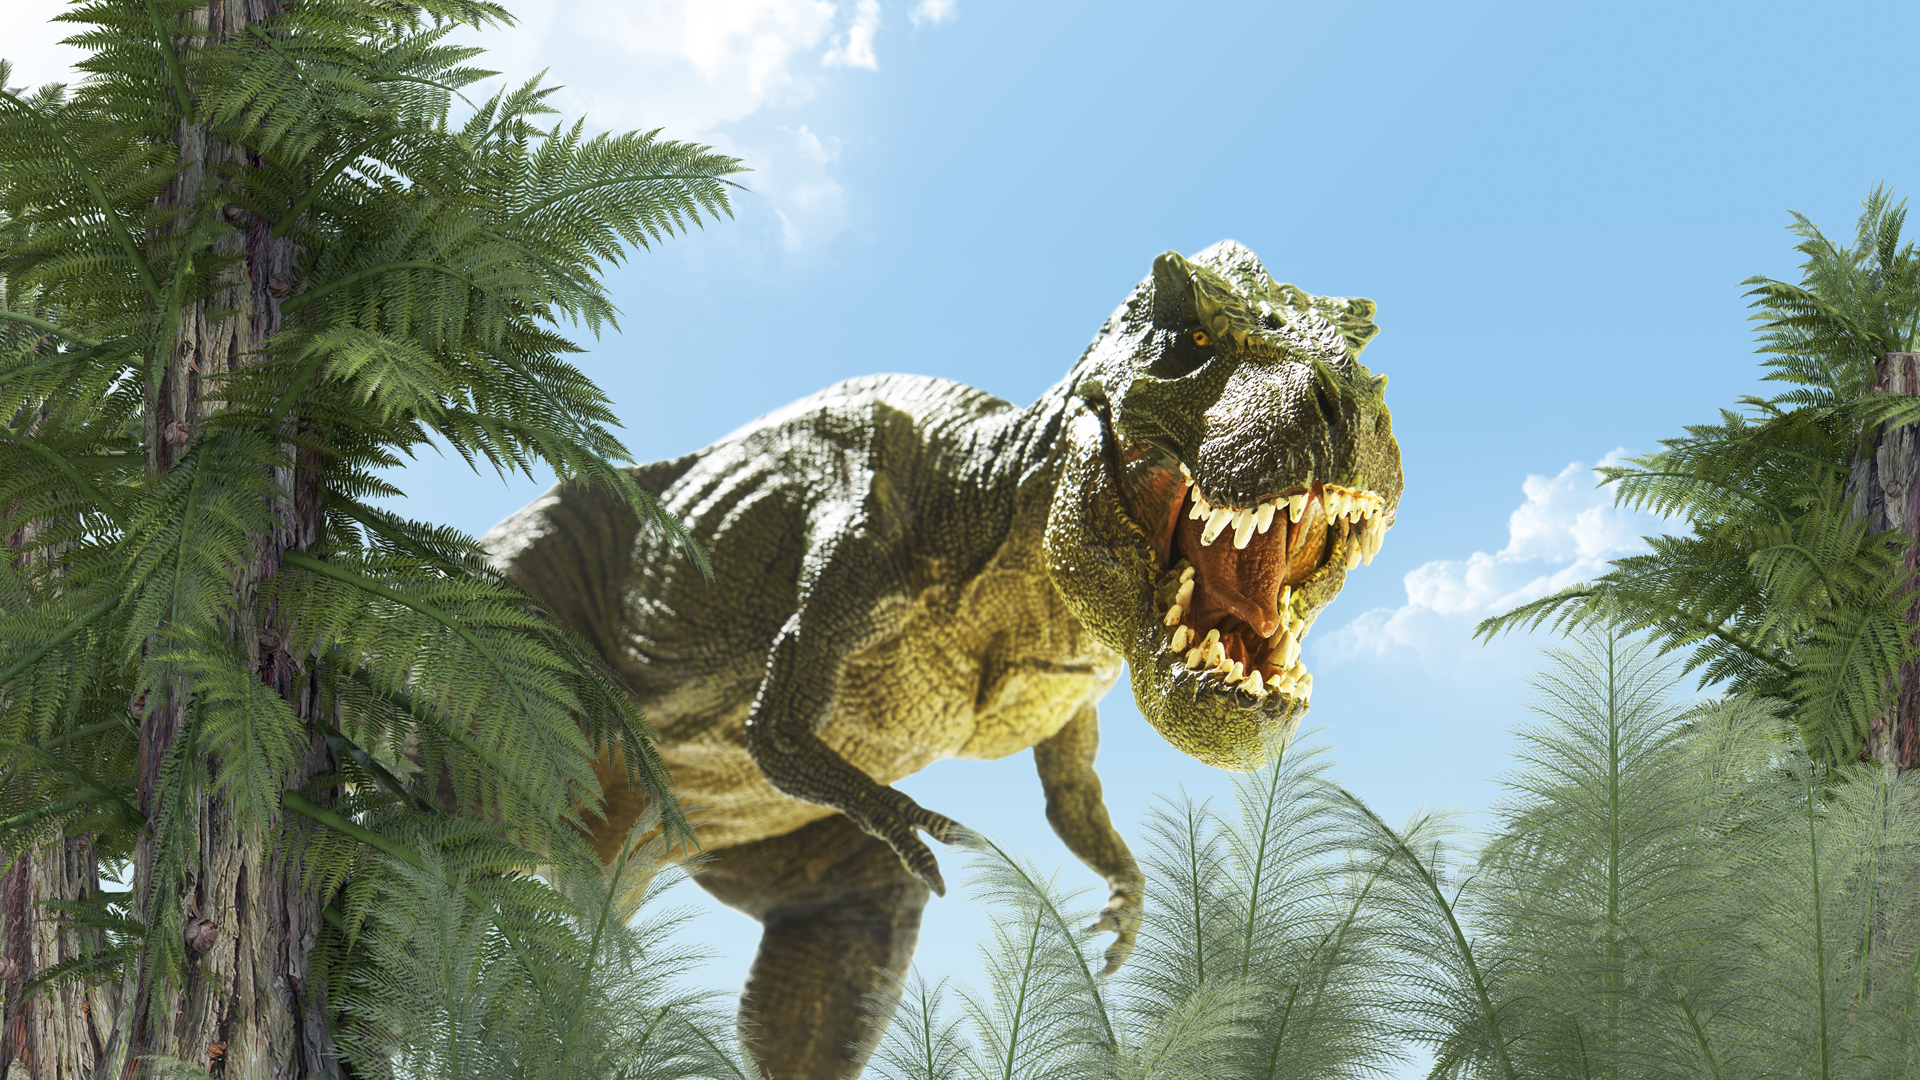 Sexo Jurasico Como Tenian Relaciones Los Tiranosaurios Rex Infobae Un dinosaurio en nueva york online. https www infobae com salud ciencia 2017 04 06 sexo jurasico como tenian relaciones los tiranosaurios rex